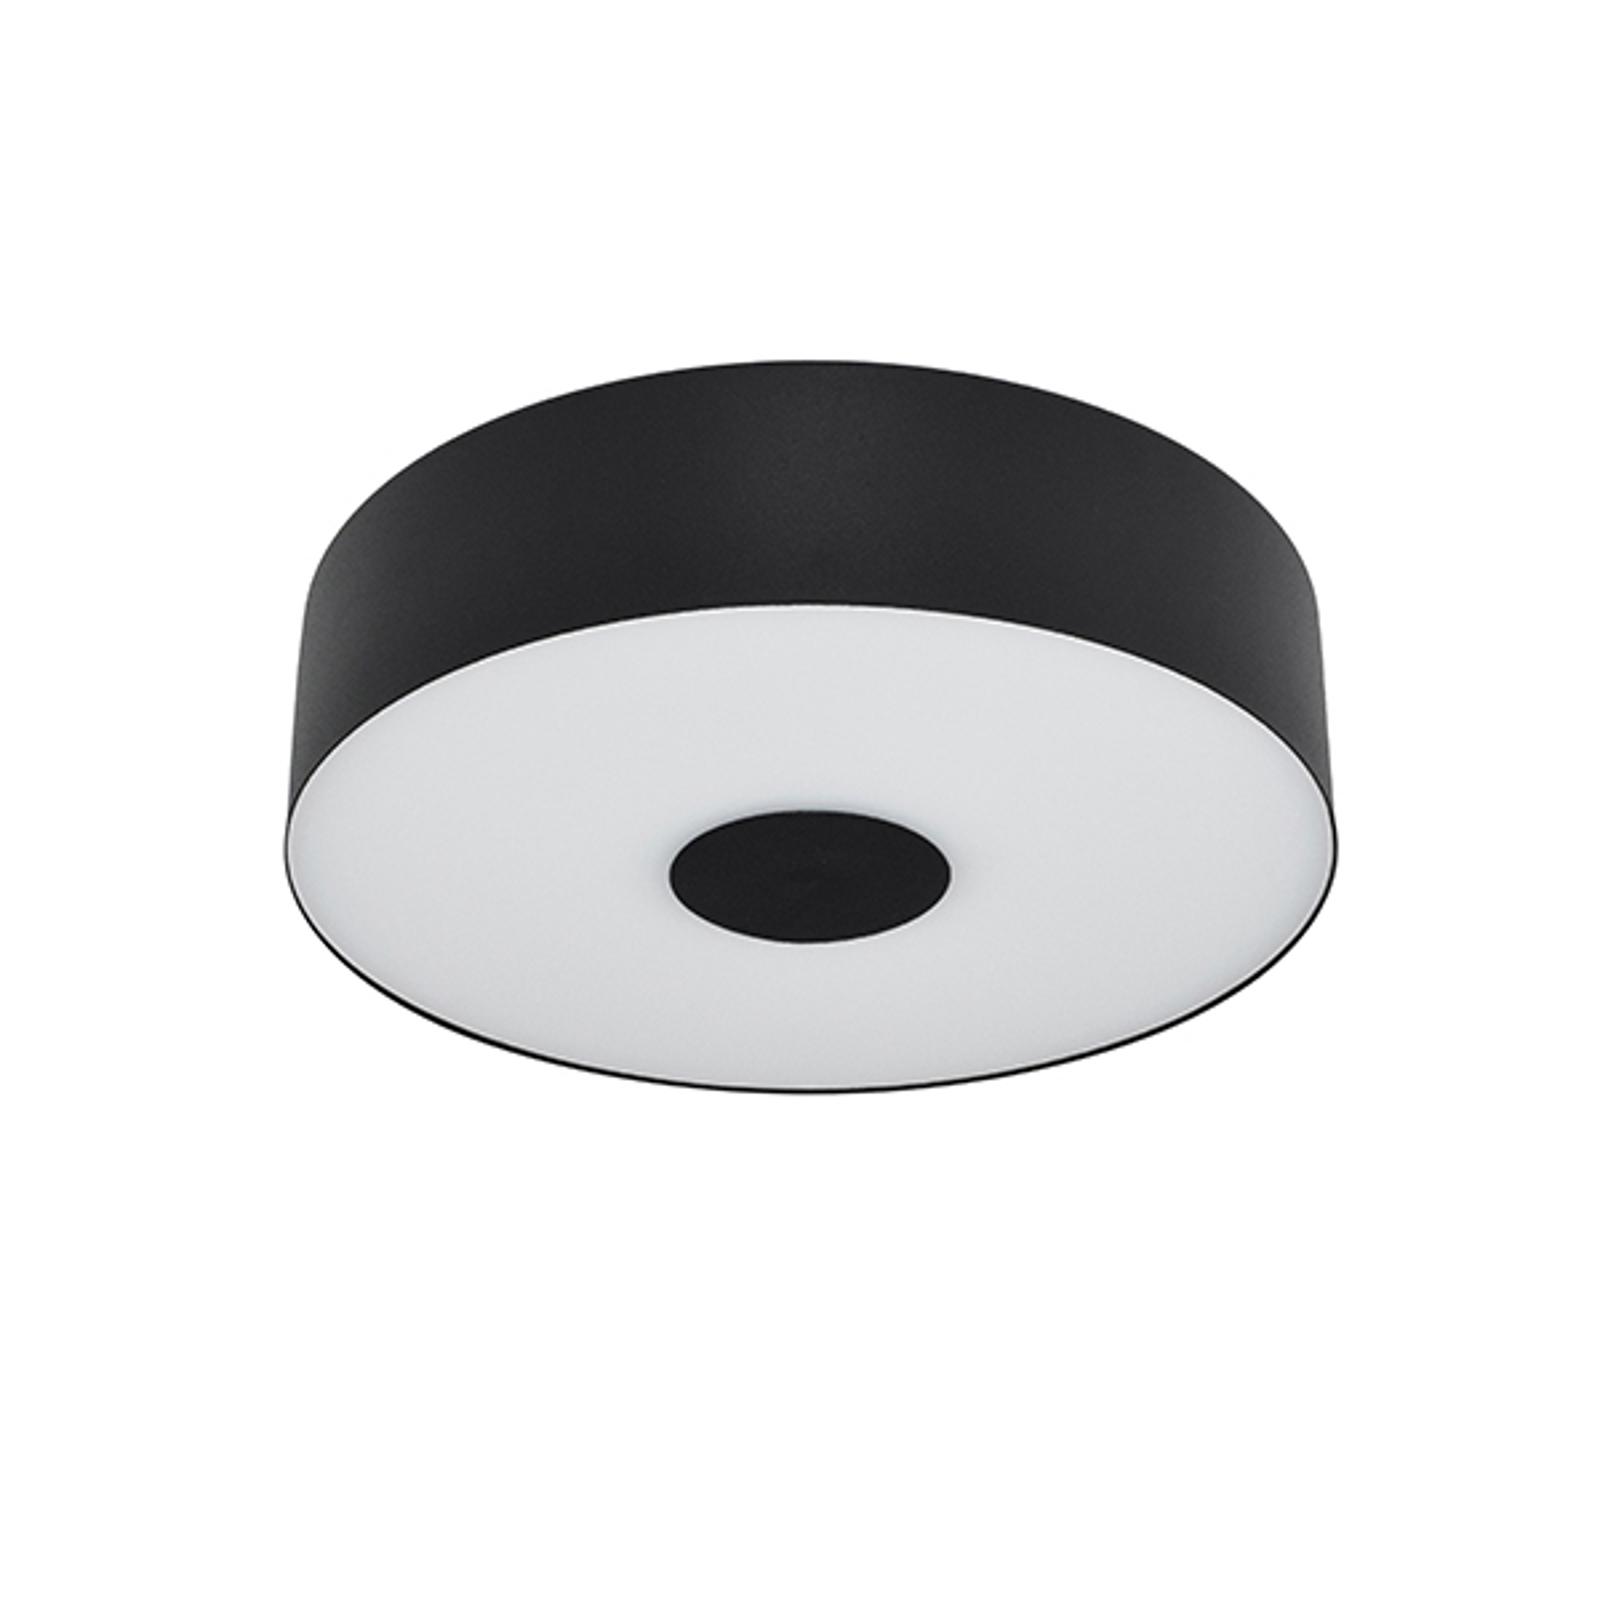 LED-taklampe Cleopatra i svart, Ø 30 cm